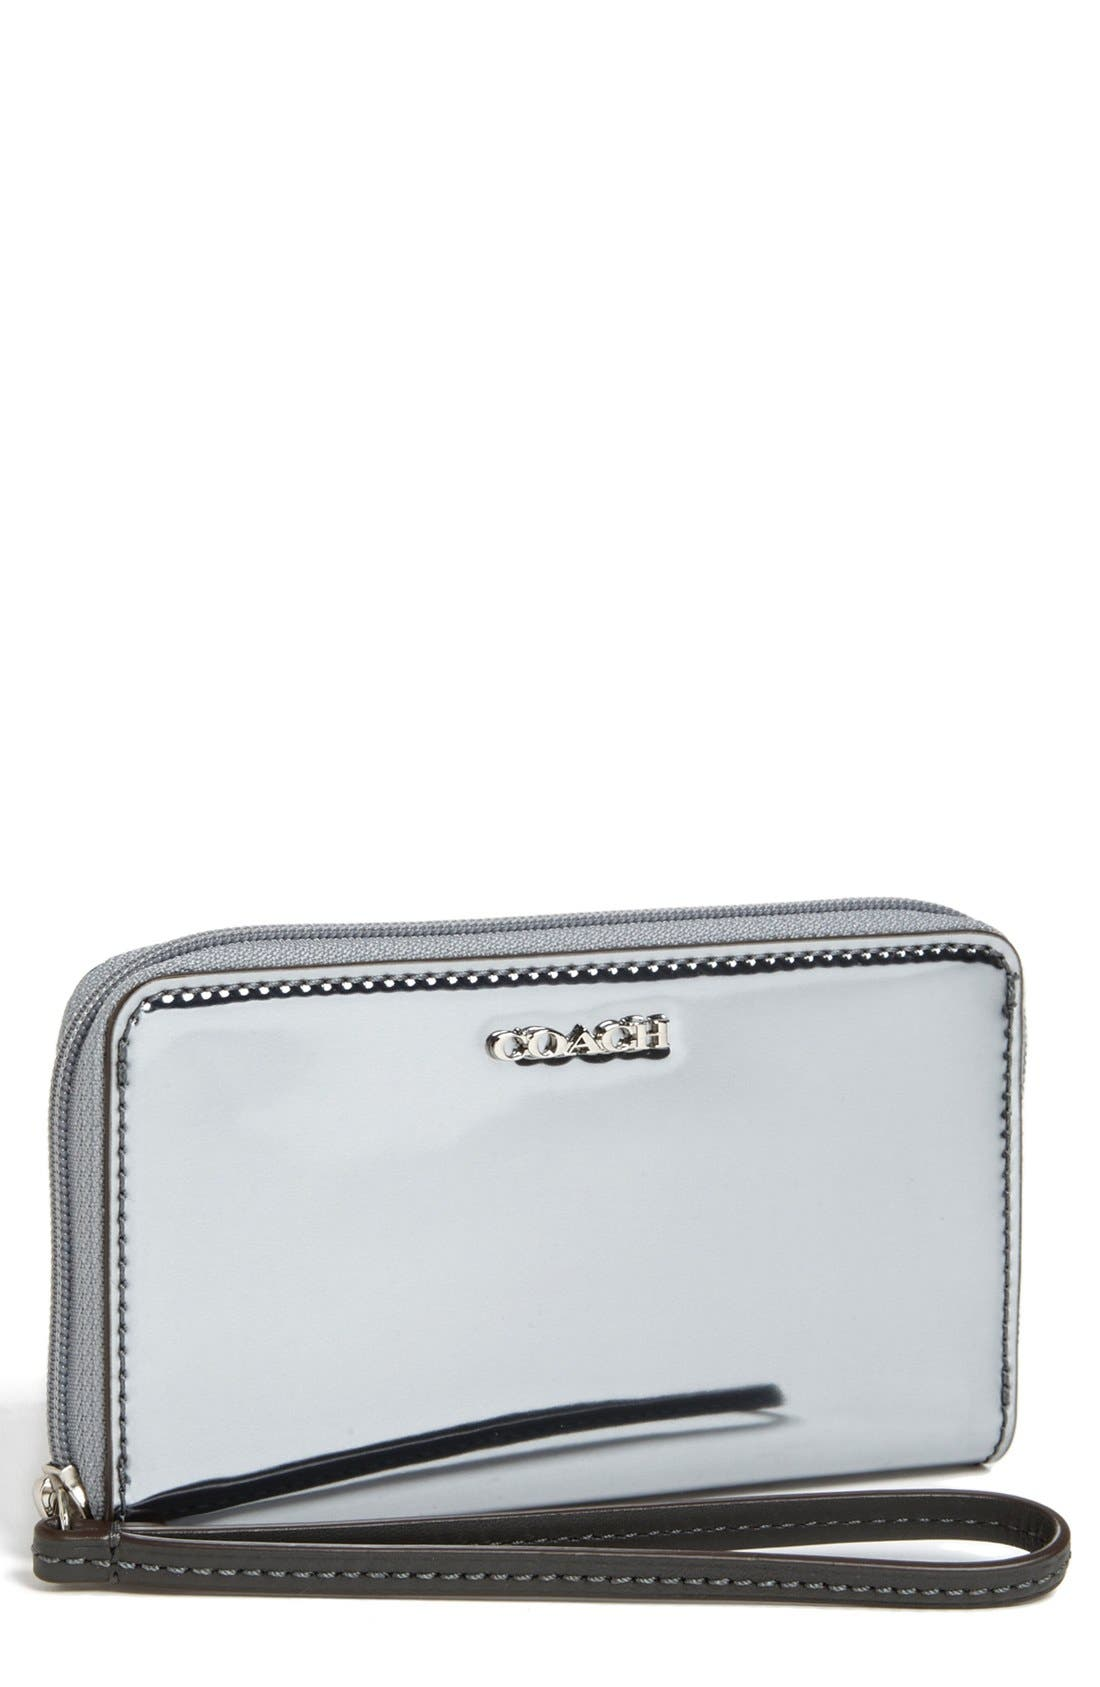 Main Image - COACH 'Legacy - Mirror Metallic' Phone Wristlet